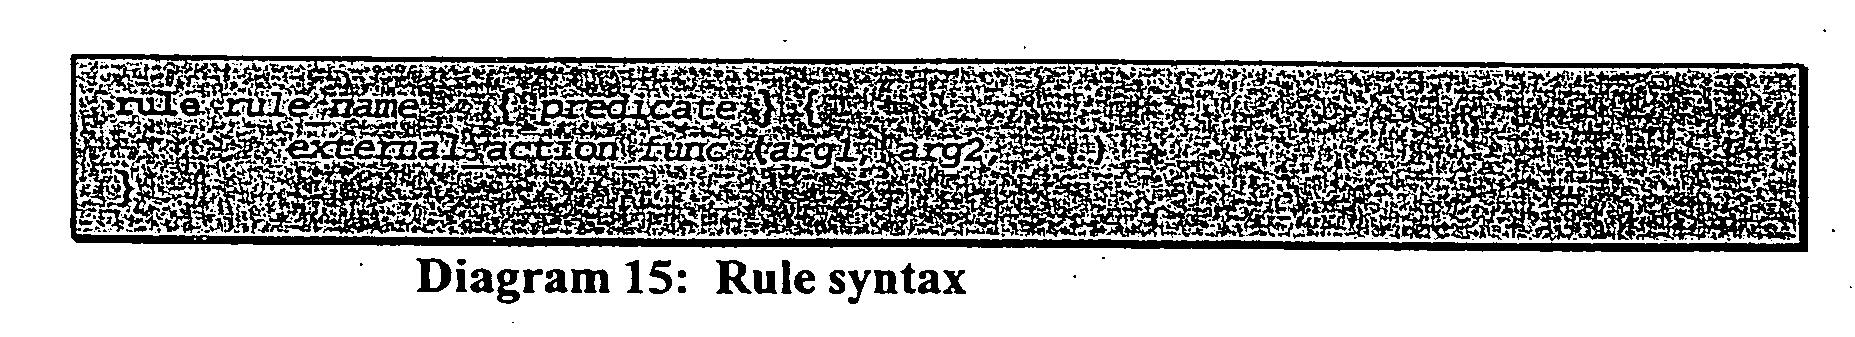 Figure US20040148382A1-20040729-P00017